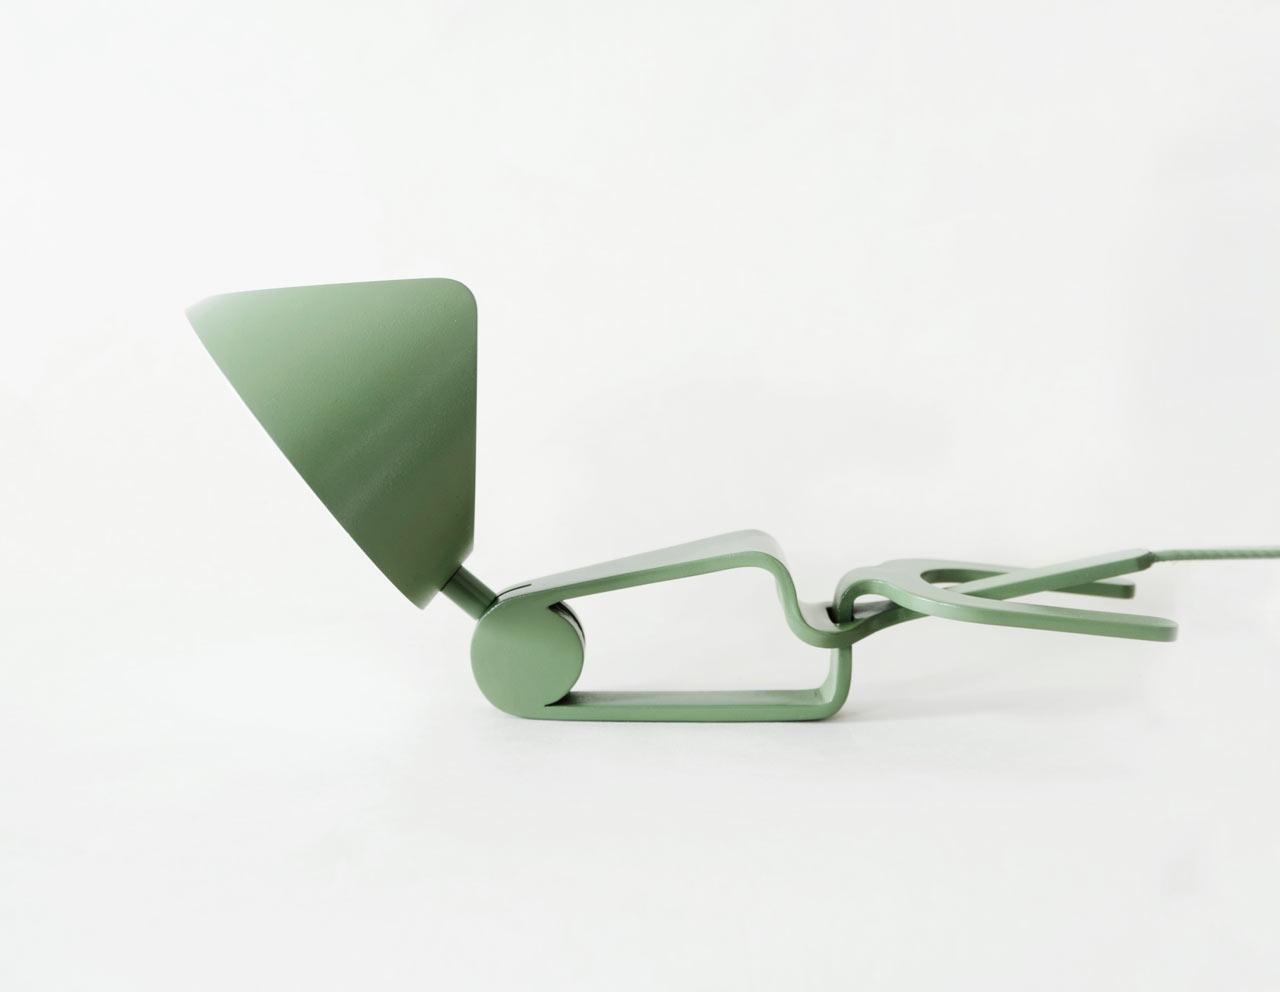 Marie-Hesseldahl-SNAP-LAMP-hisheji (2)